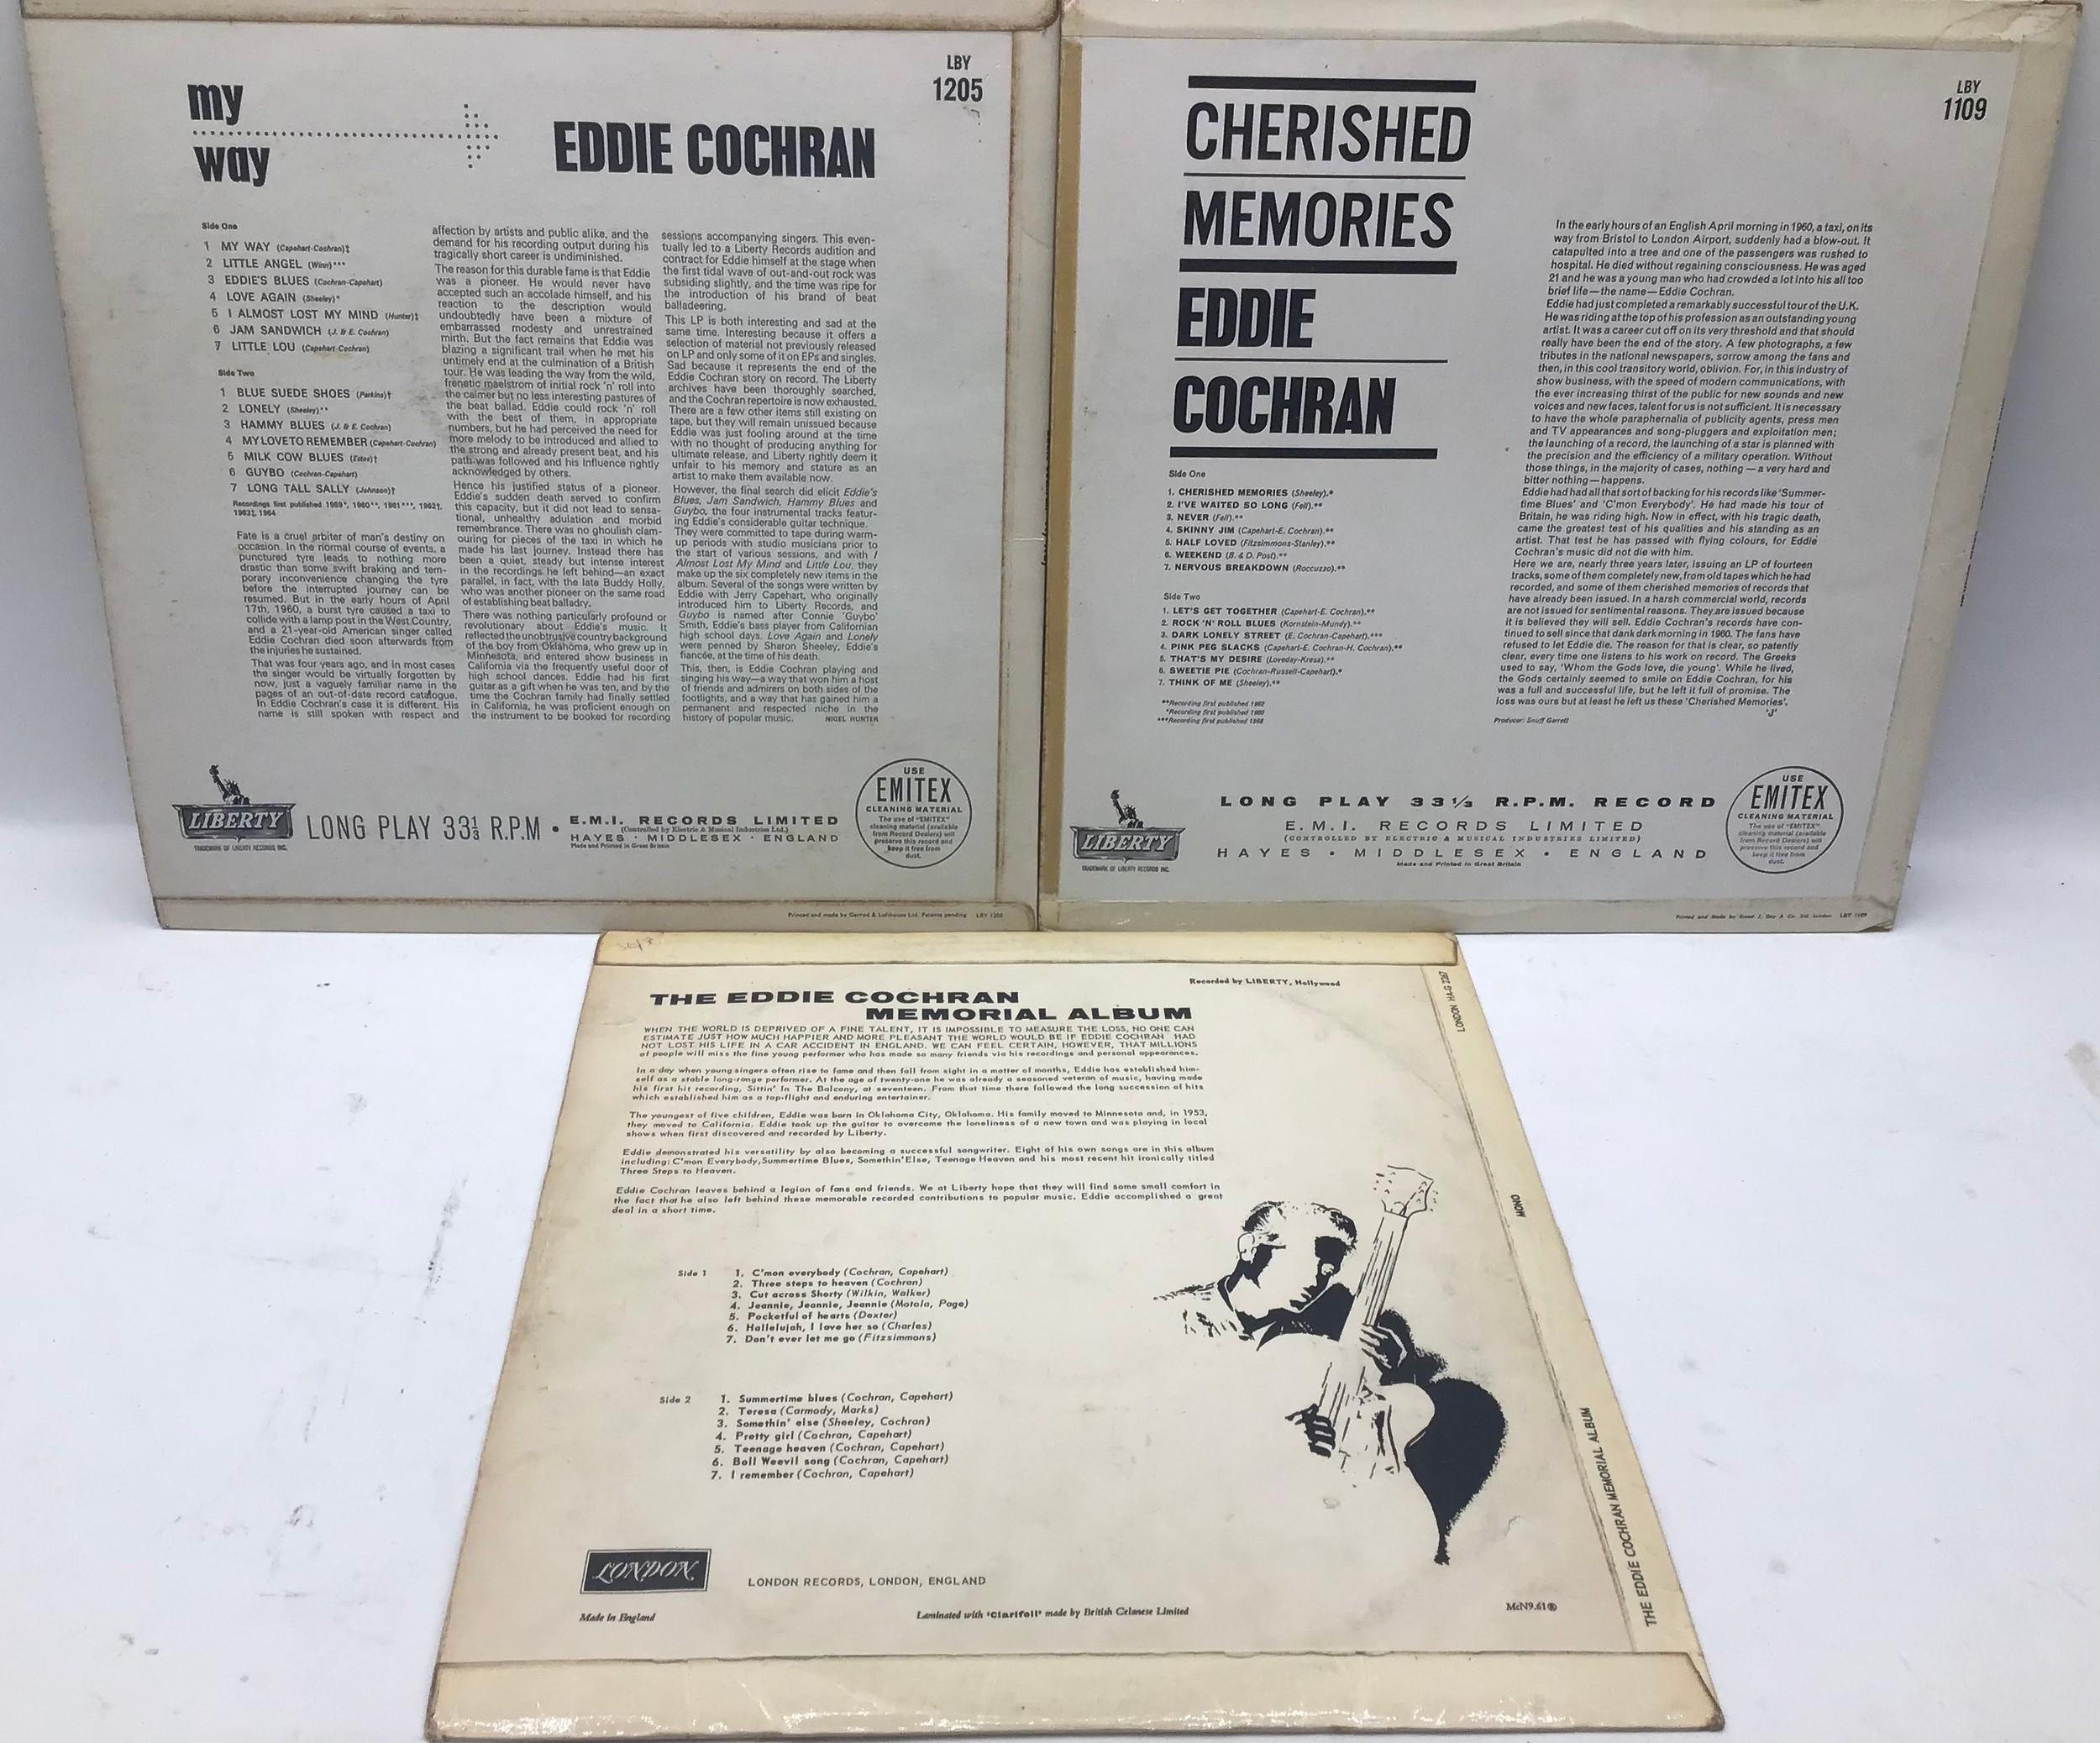 3 EDDIE COCHRAN original vinyl LP records. Album titles as follows : My Way - Cherished Memories and - Image 2 of 2